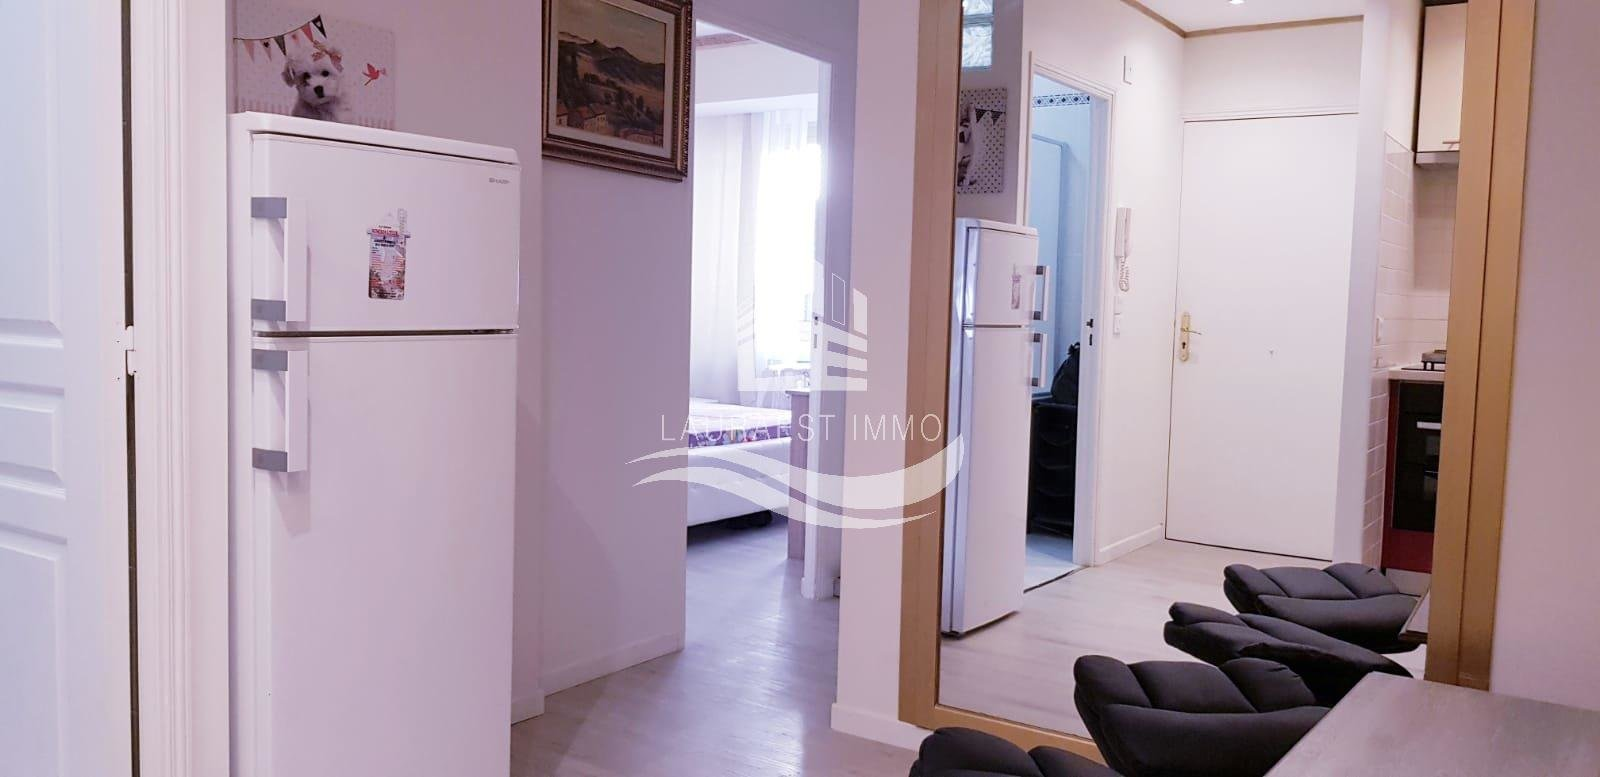 Apartment with sea view/Negresco/Golden Square